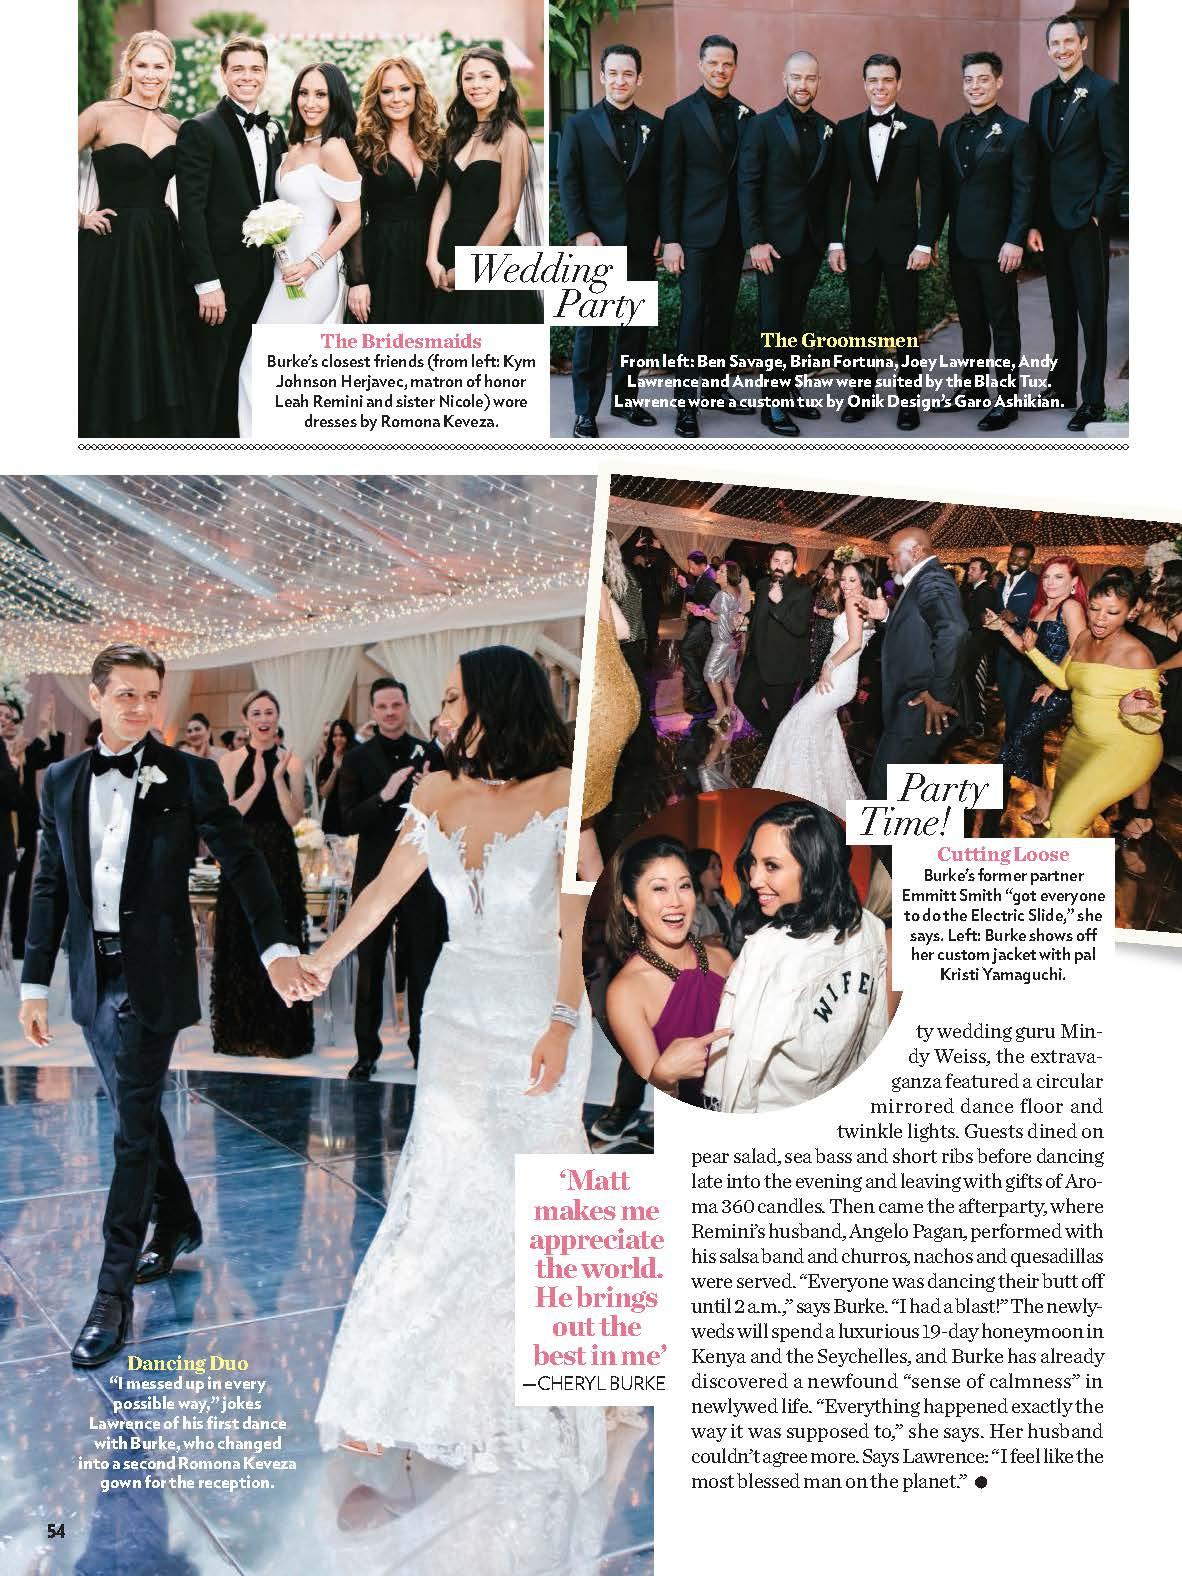 Cheryl and Matt Wedding People magazine_Page_4.jpg